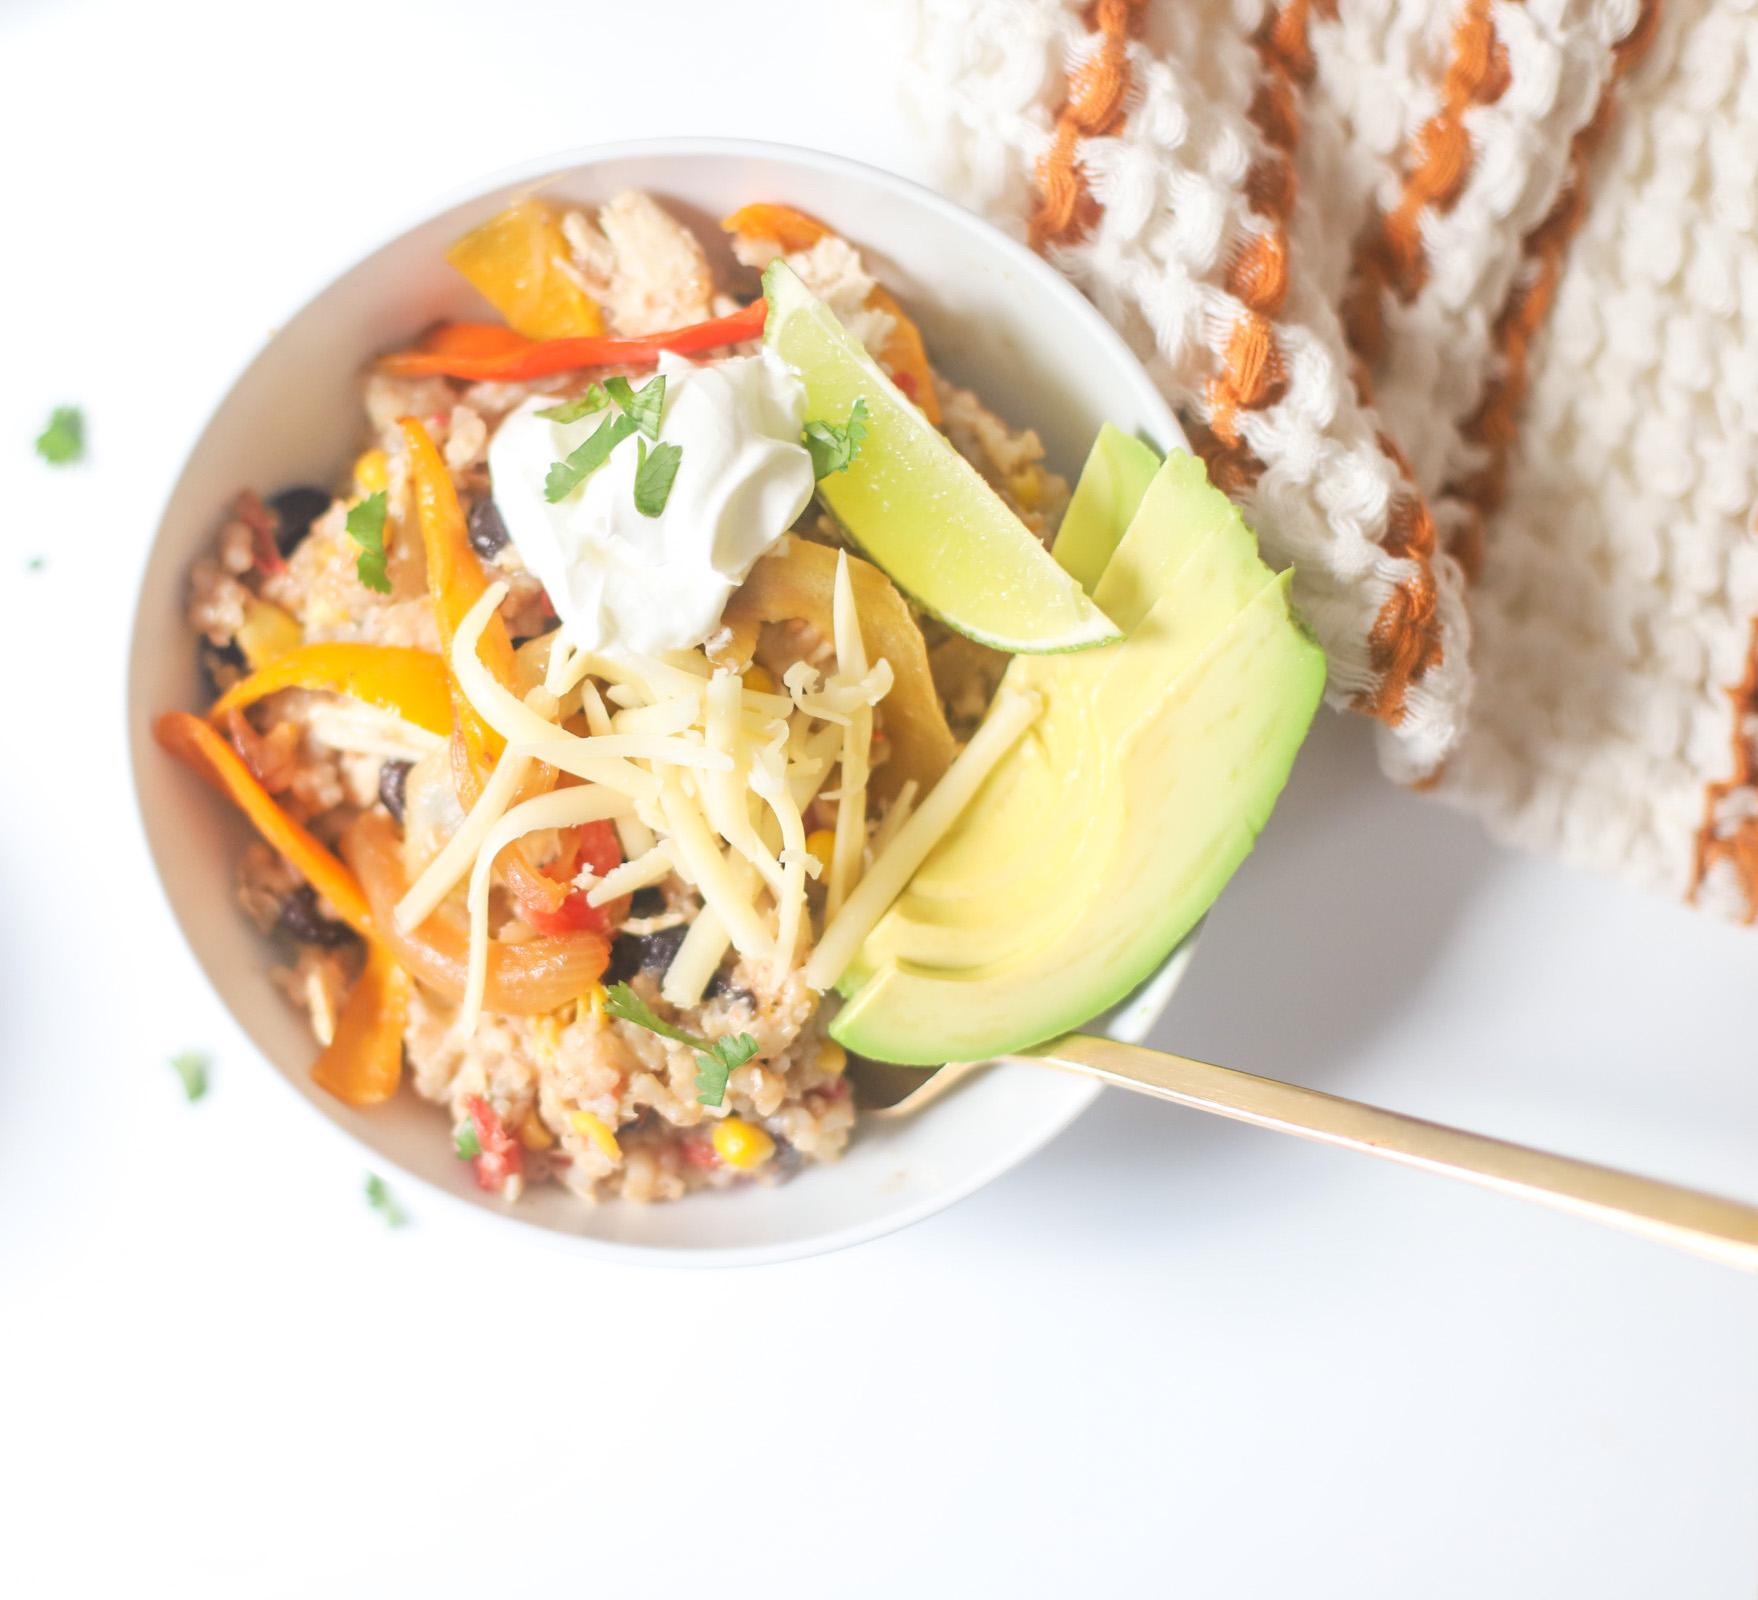 Instant Pot Loaded Chicken Fajita Bowls - Easy Weeknight Dinner Recipe | @glitterinclexi | GLITTERINC.COM